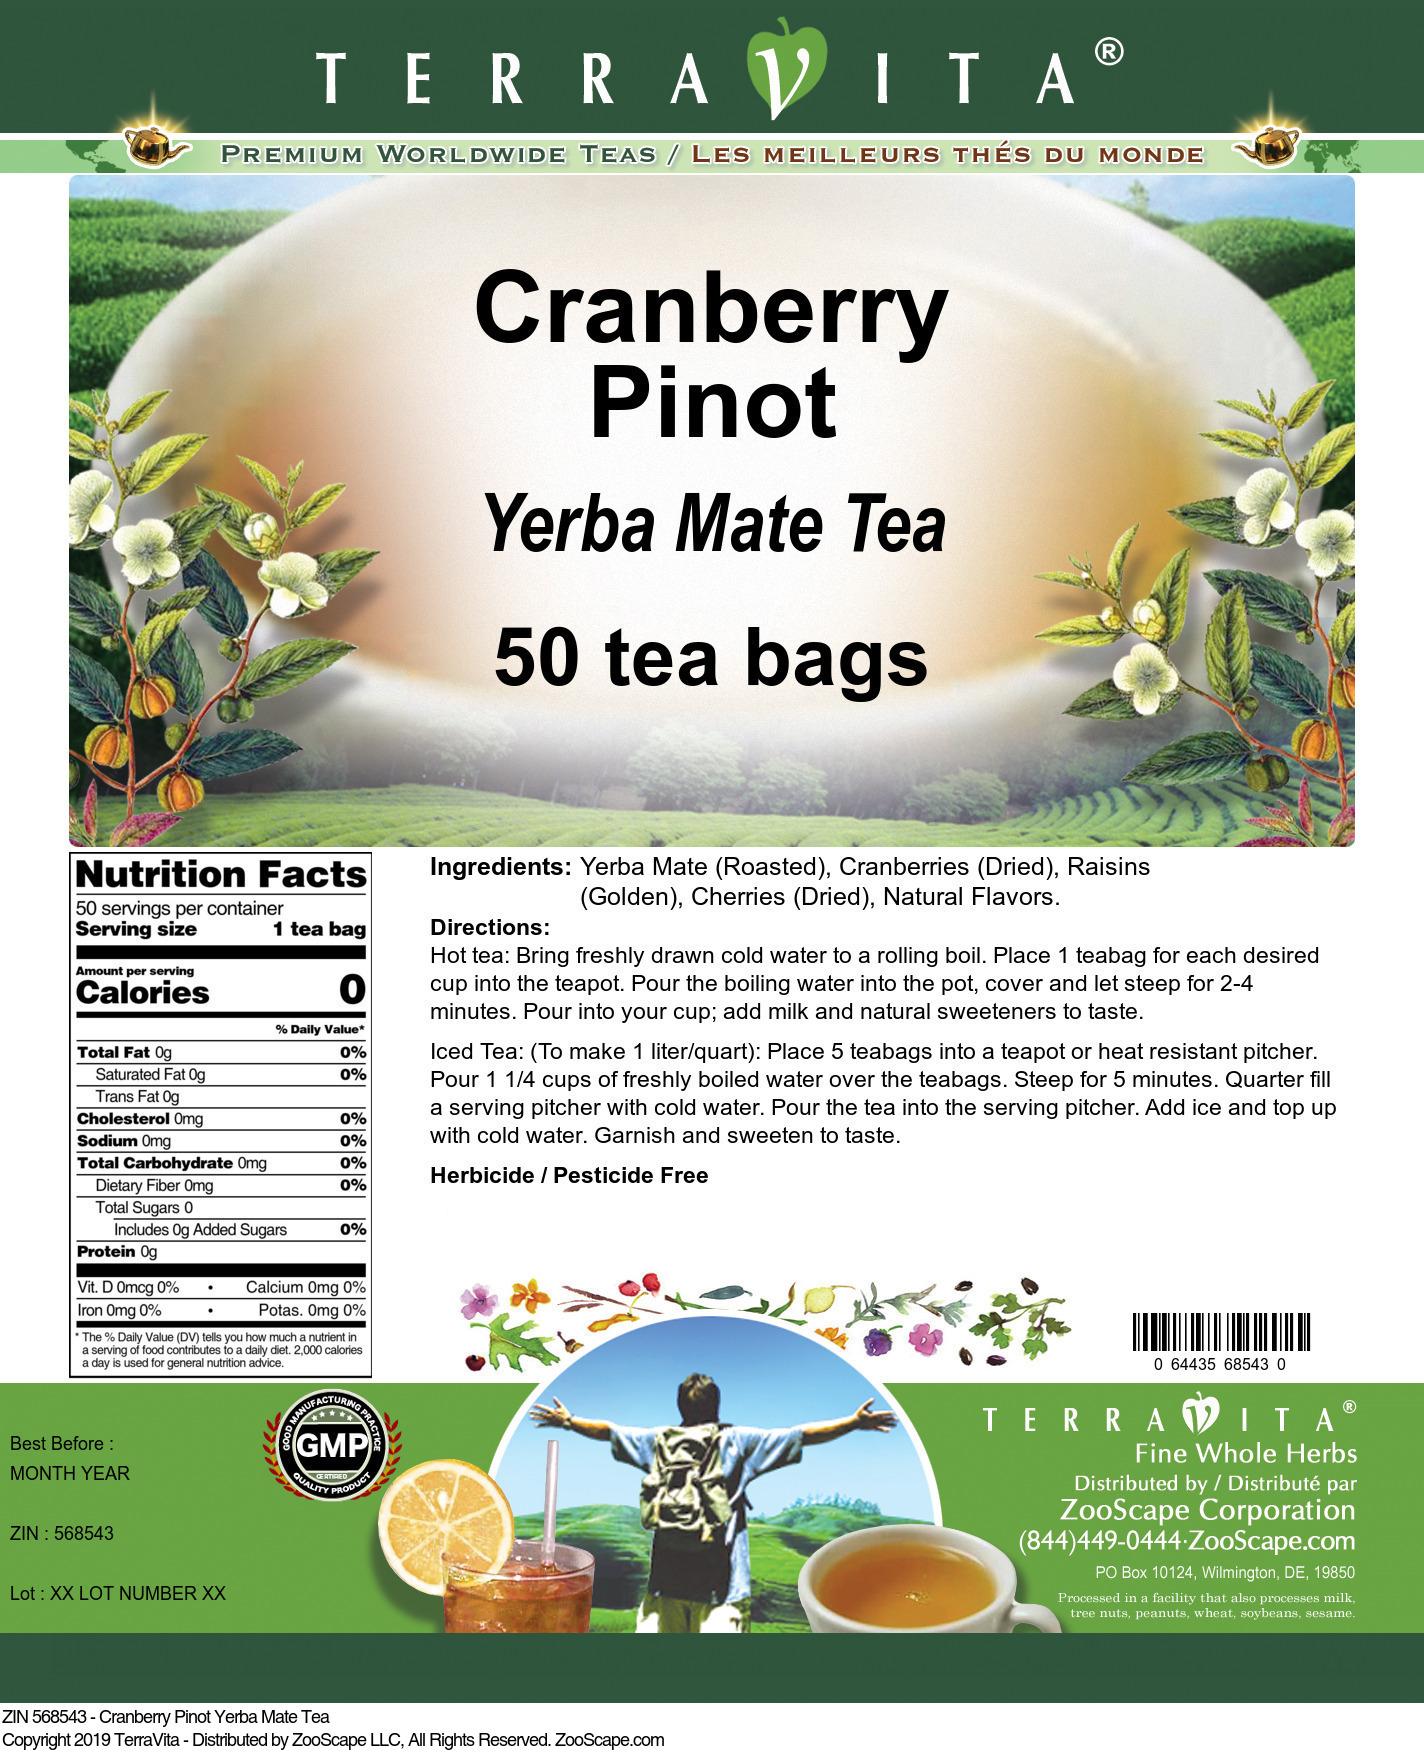 Cranberry Pinot Yerba Mate